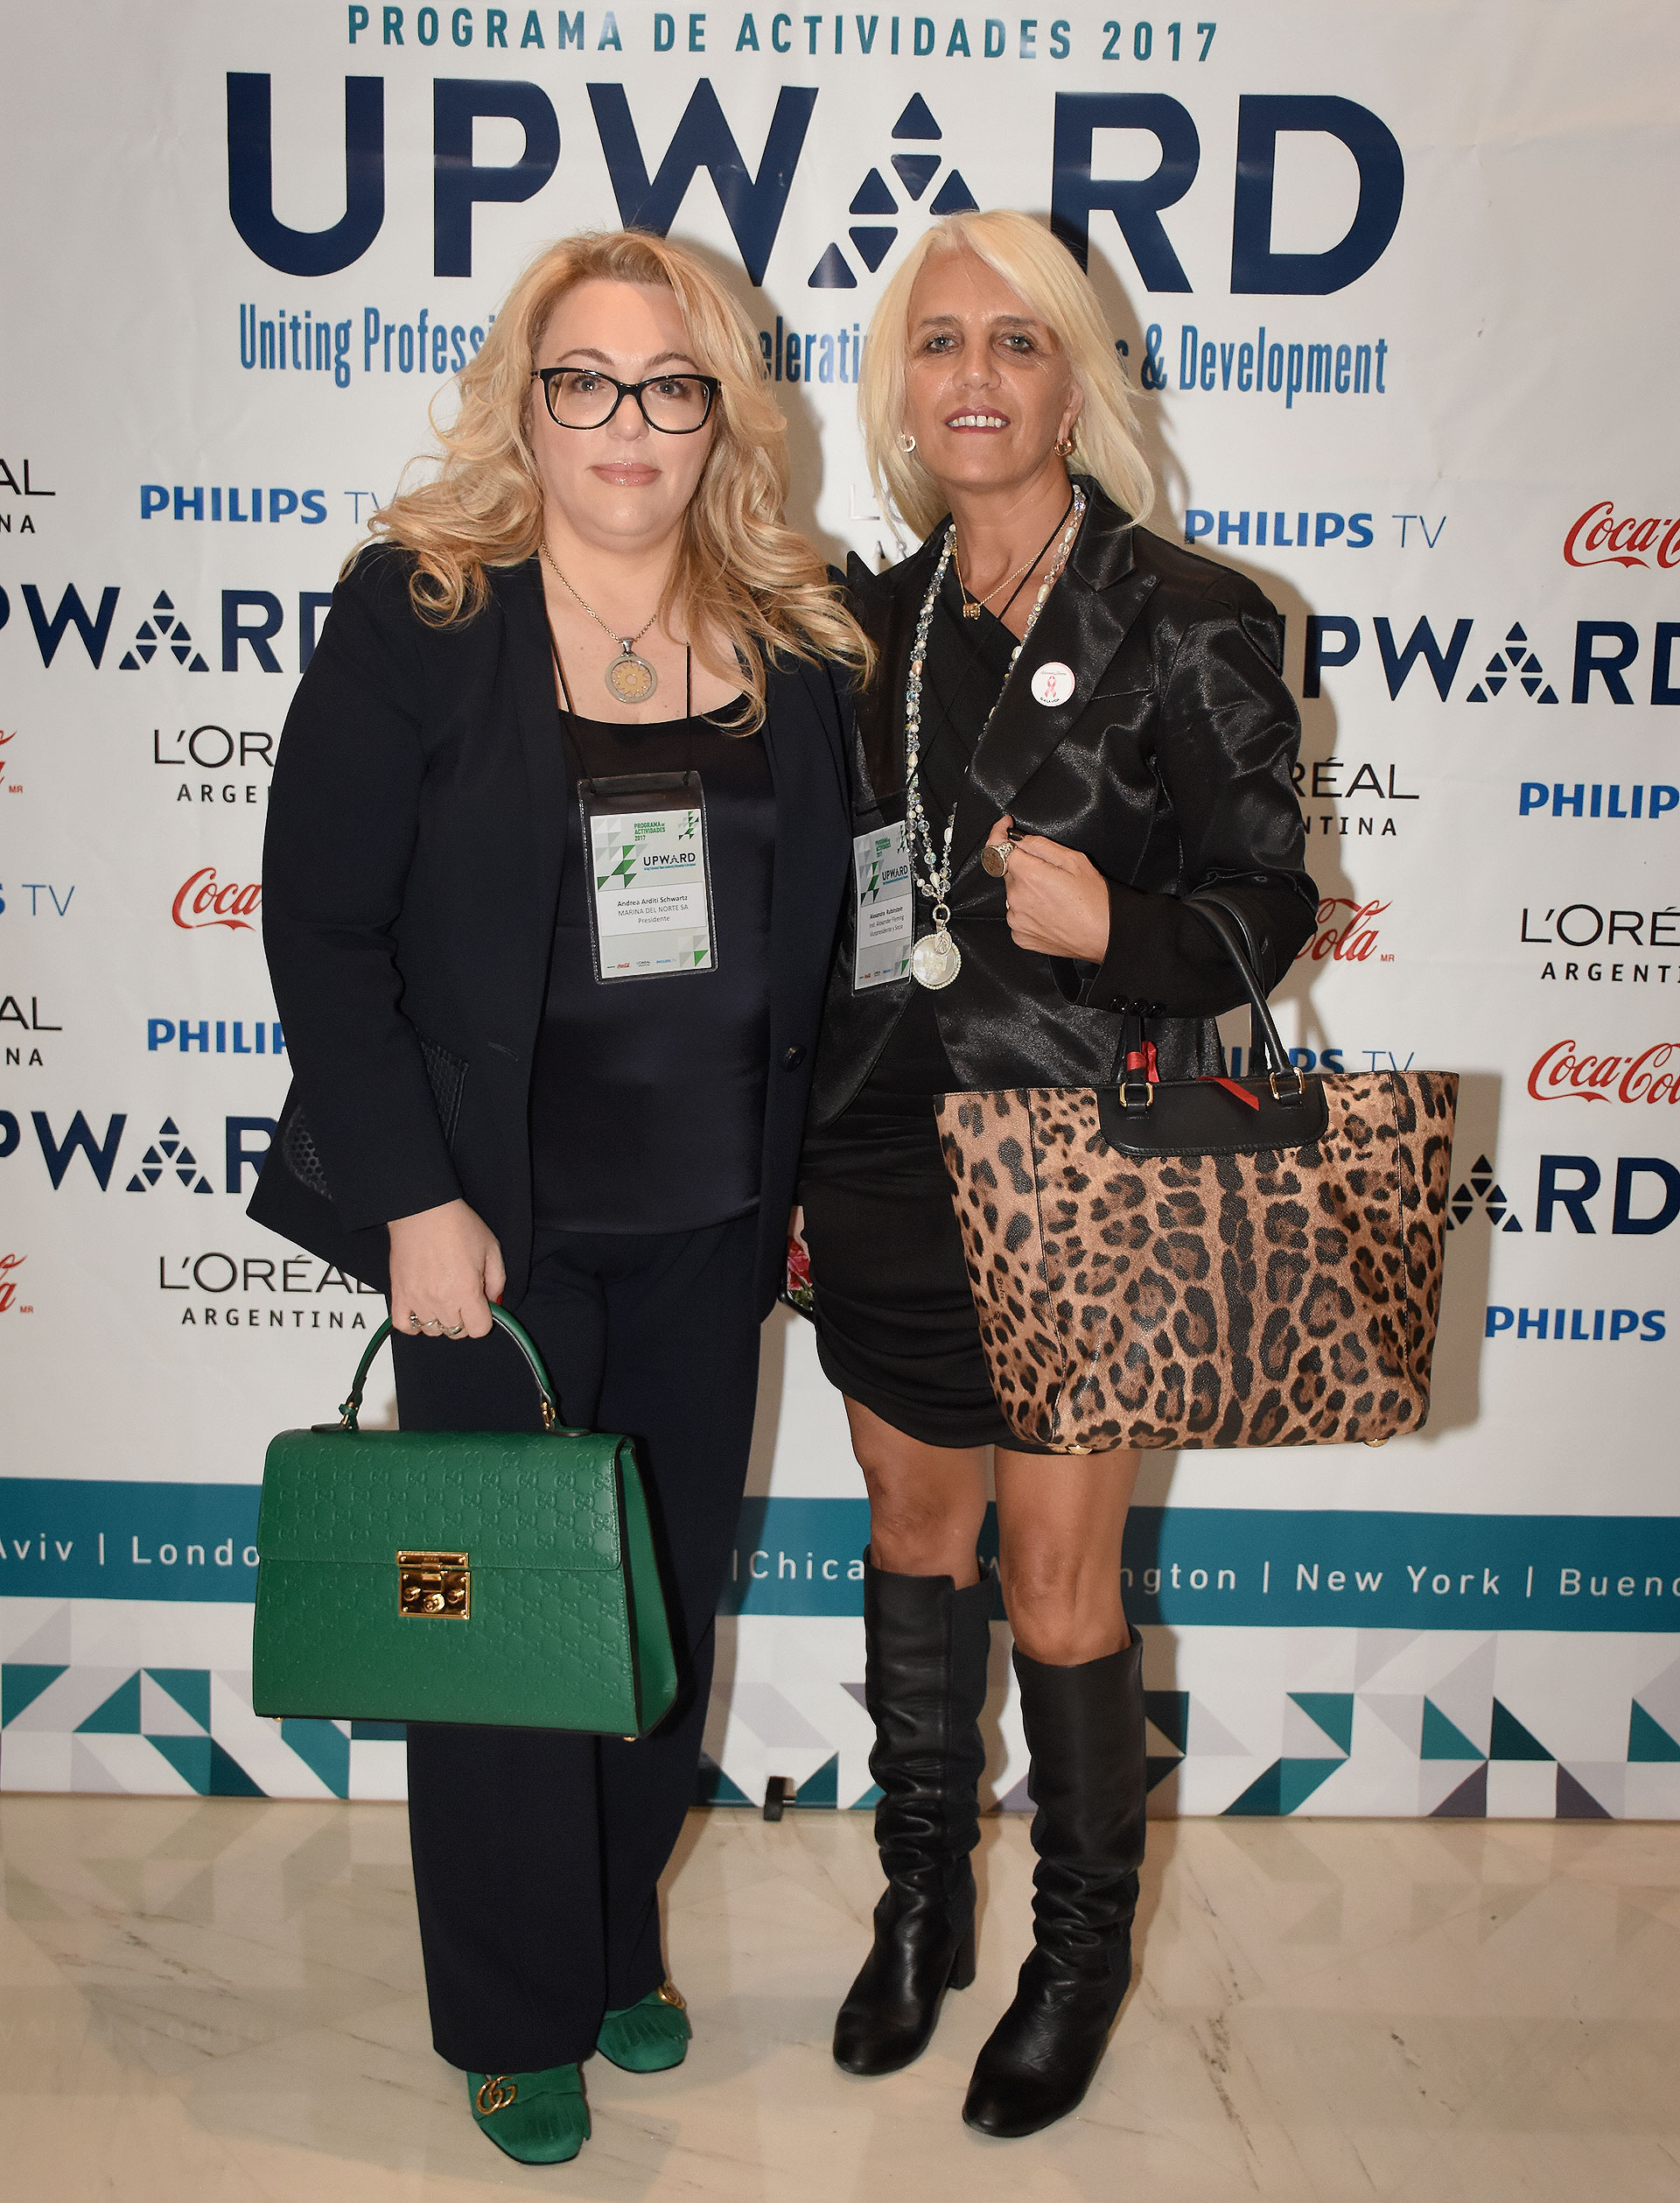 Andrea Arditi Schwartz (Marina del Norte) y Alejandra Rubinstein (Instituto Alexander Fleming)